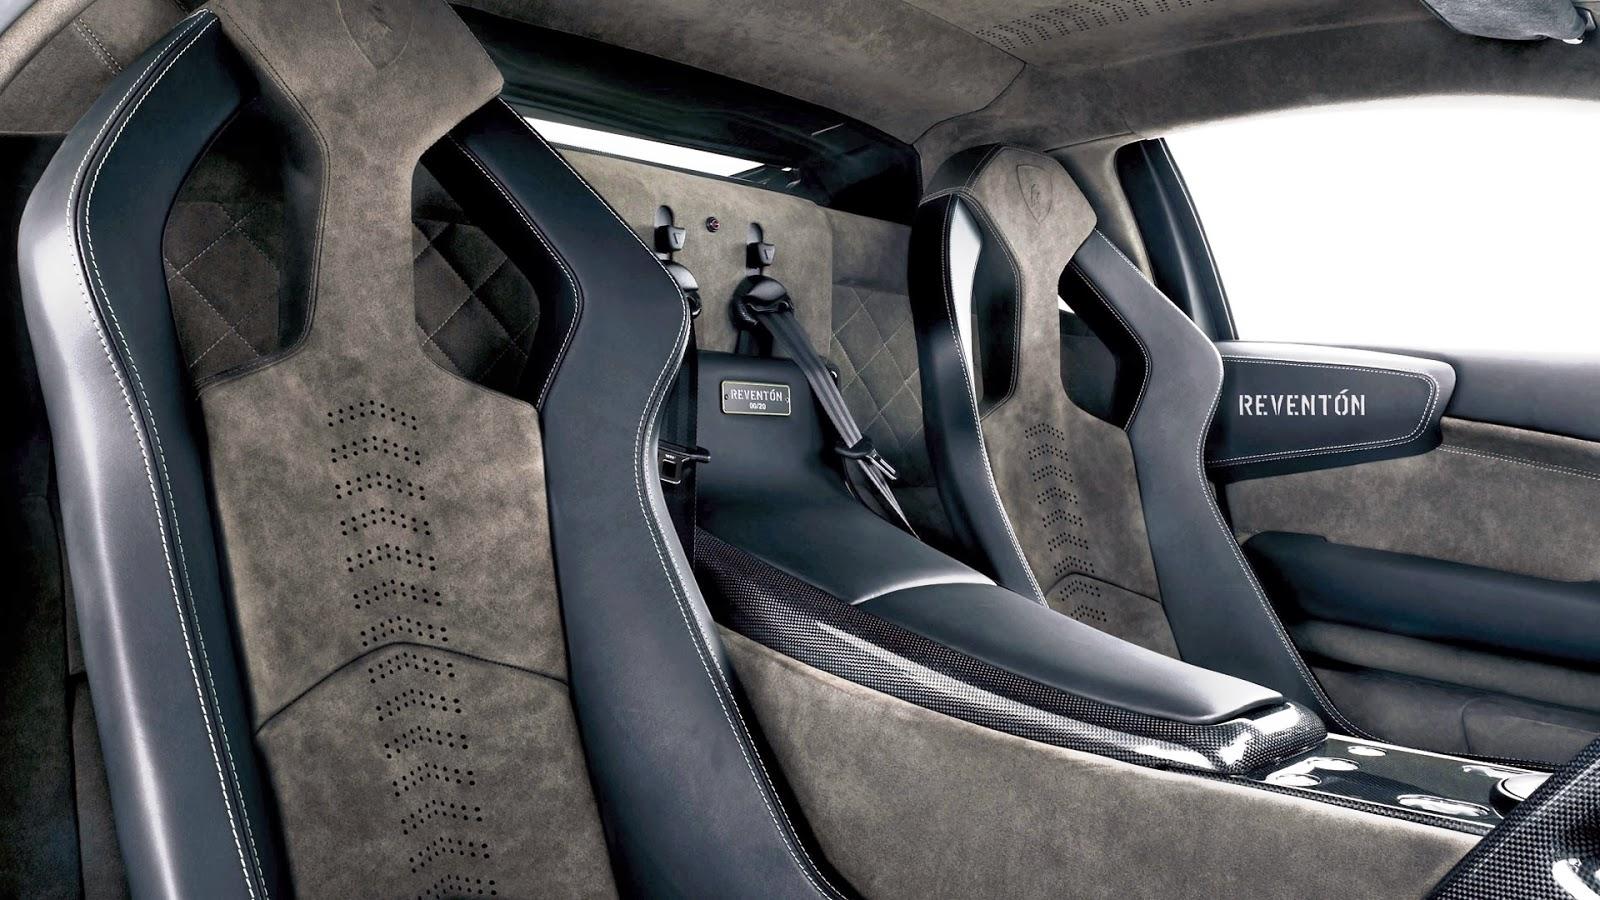 2014 Reviews Lamborghini Aventador Topspeed Acceleration